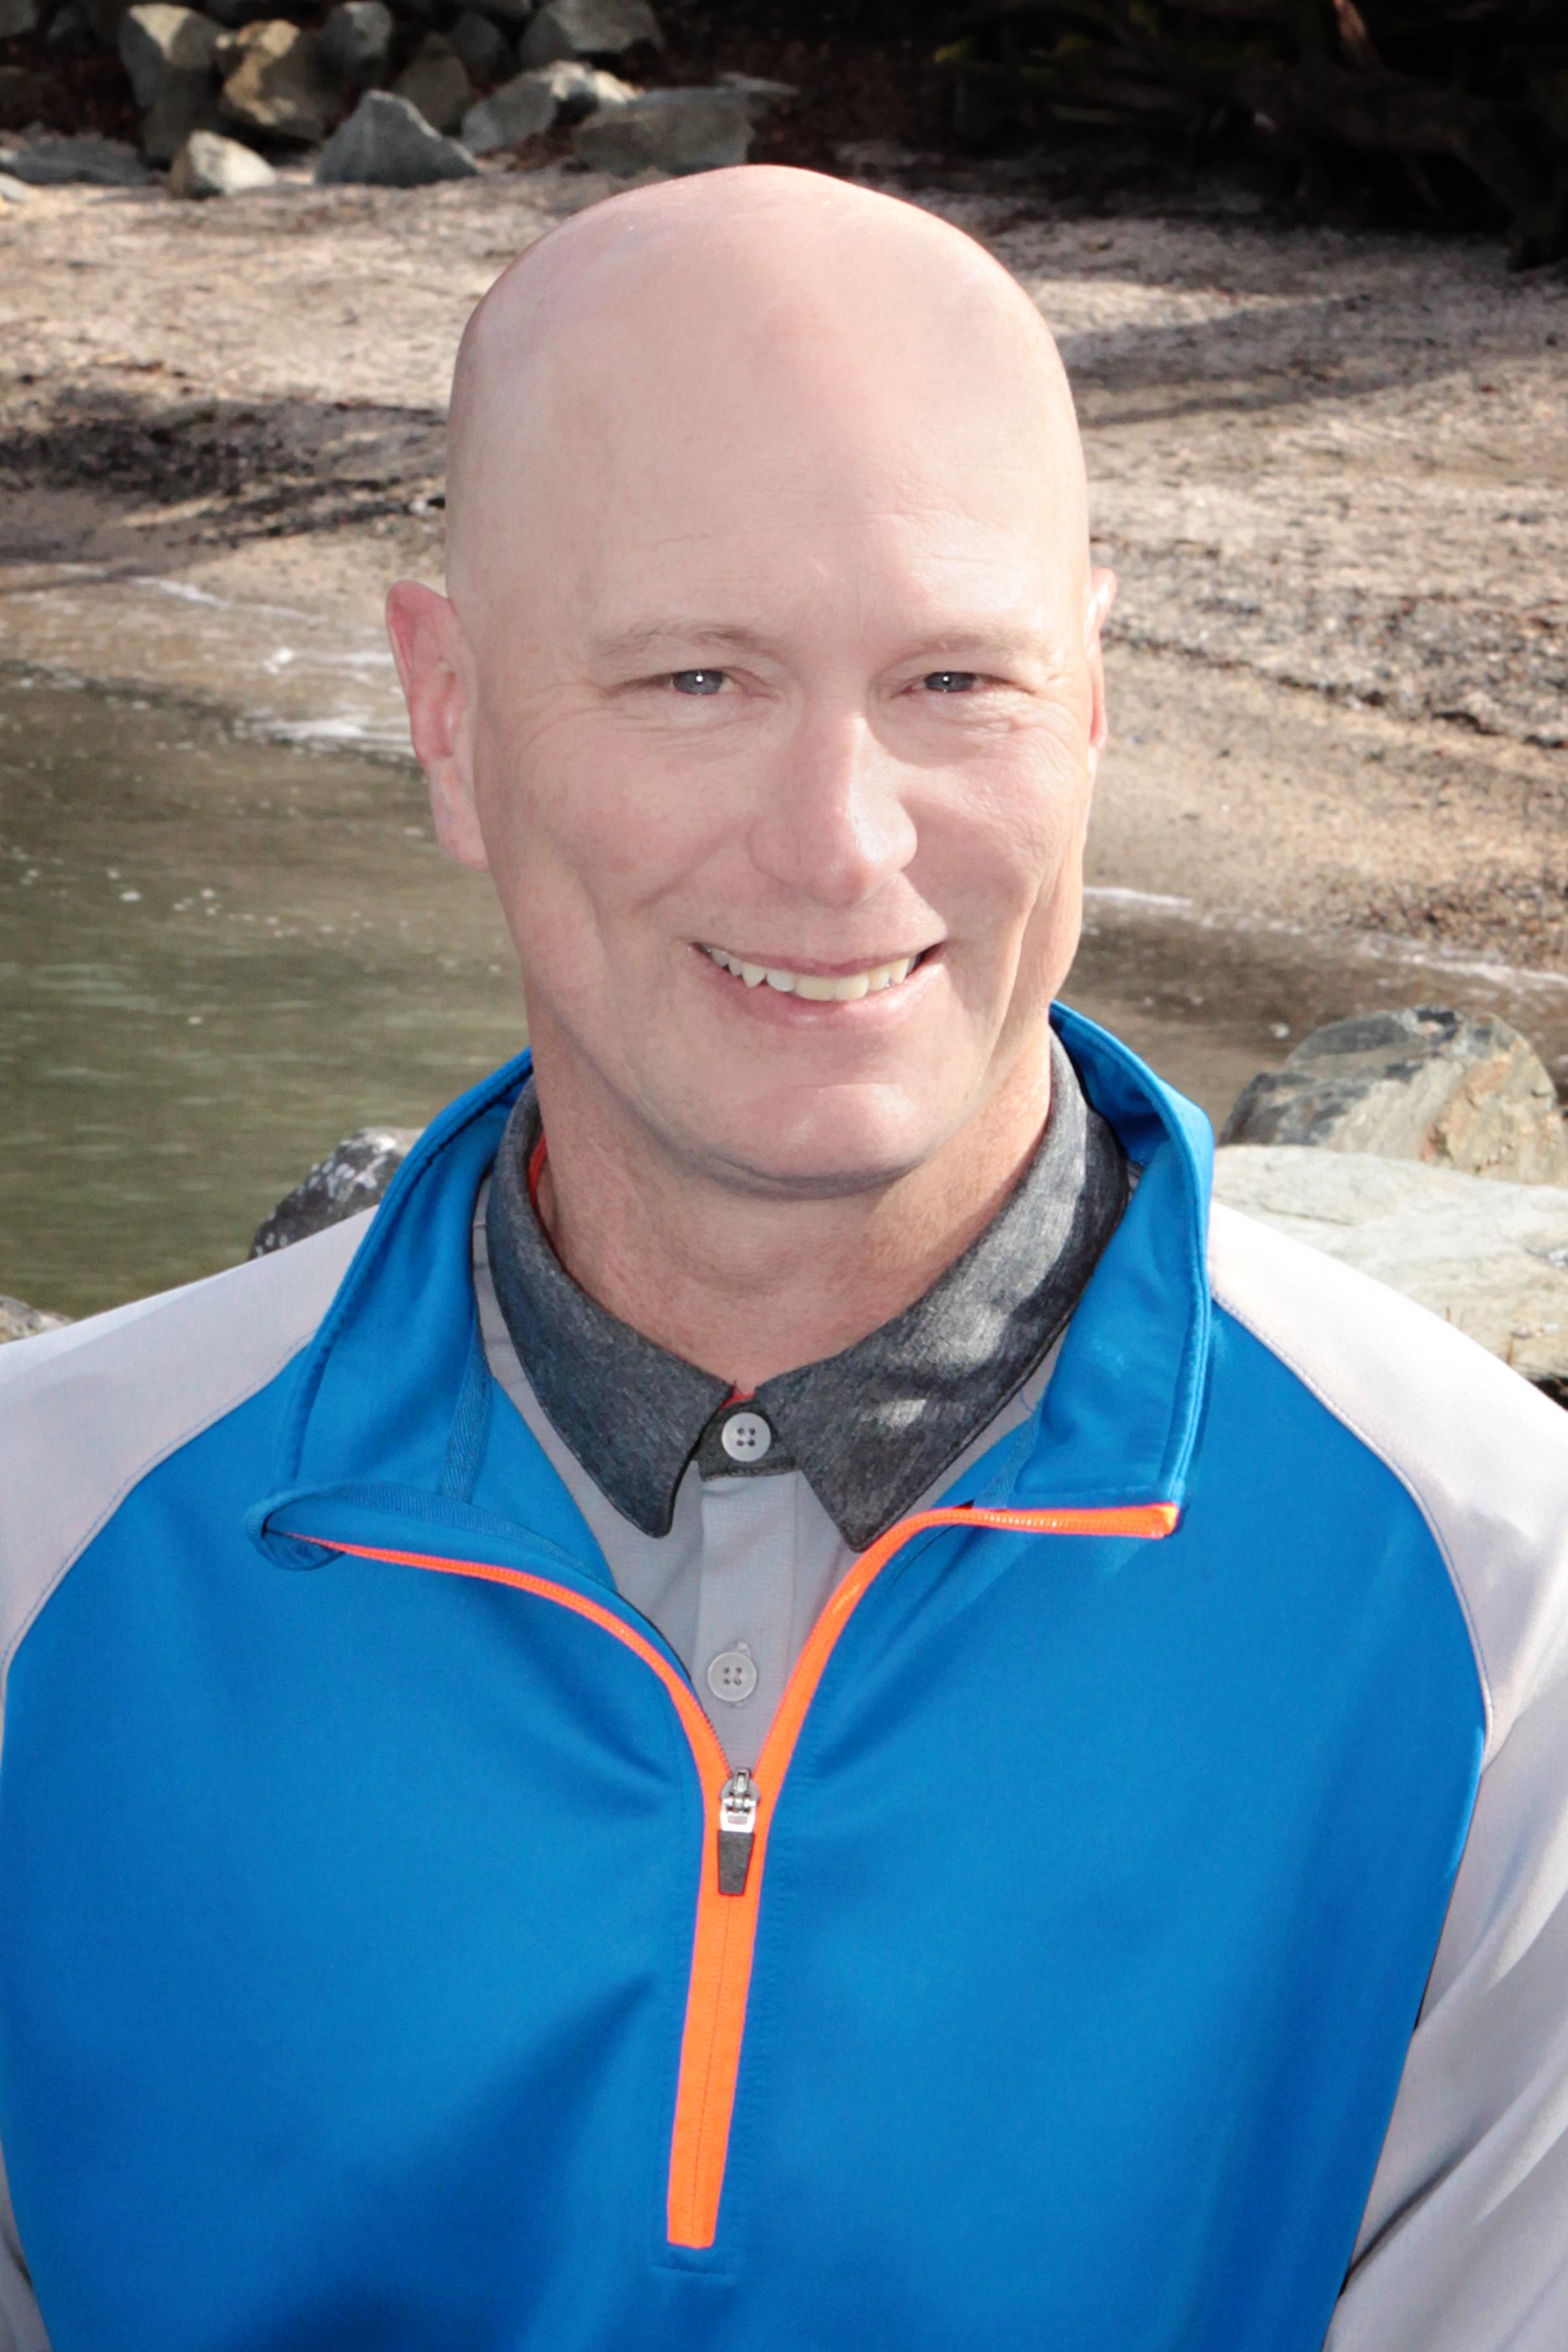 Brian Weeda at the beach wearing a blue jacket